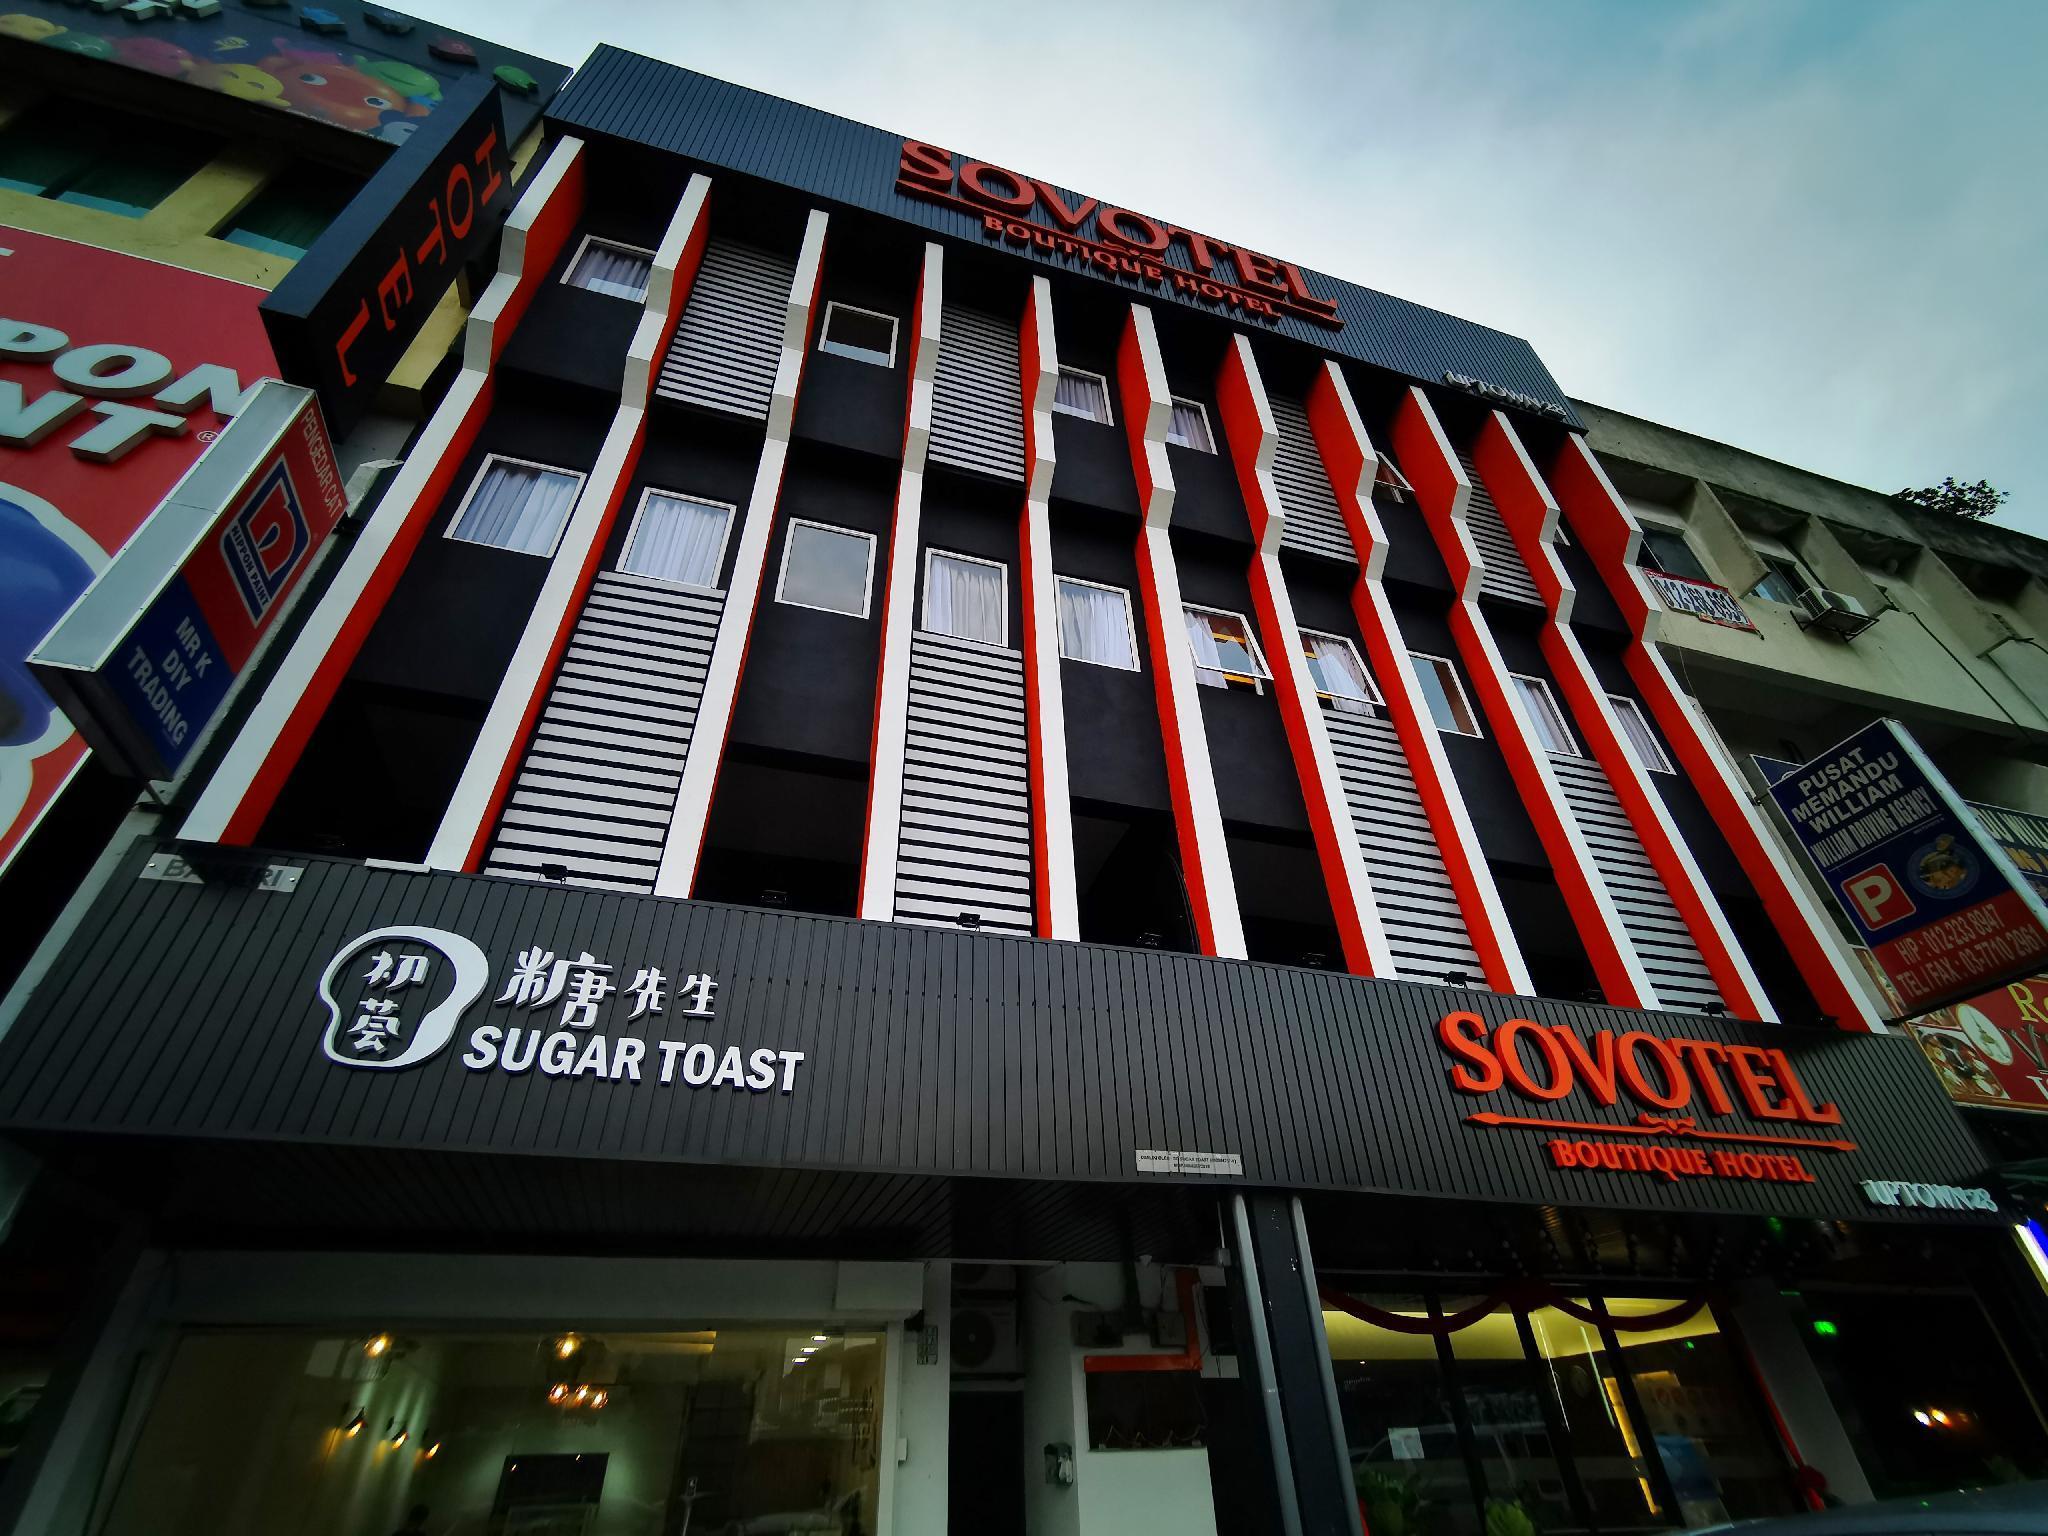 Sovotel Boutique Hotel @ Uptown 28